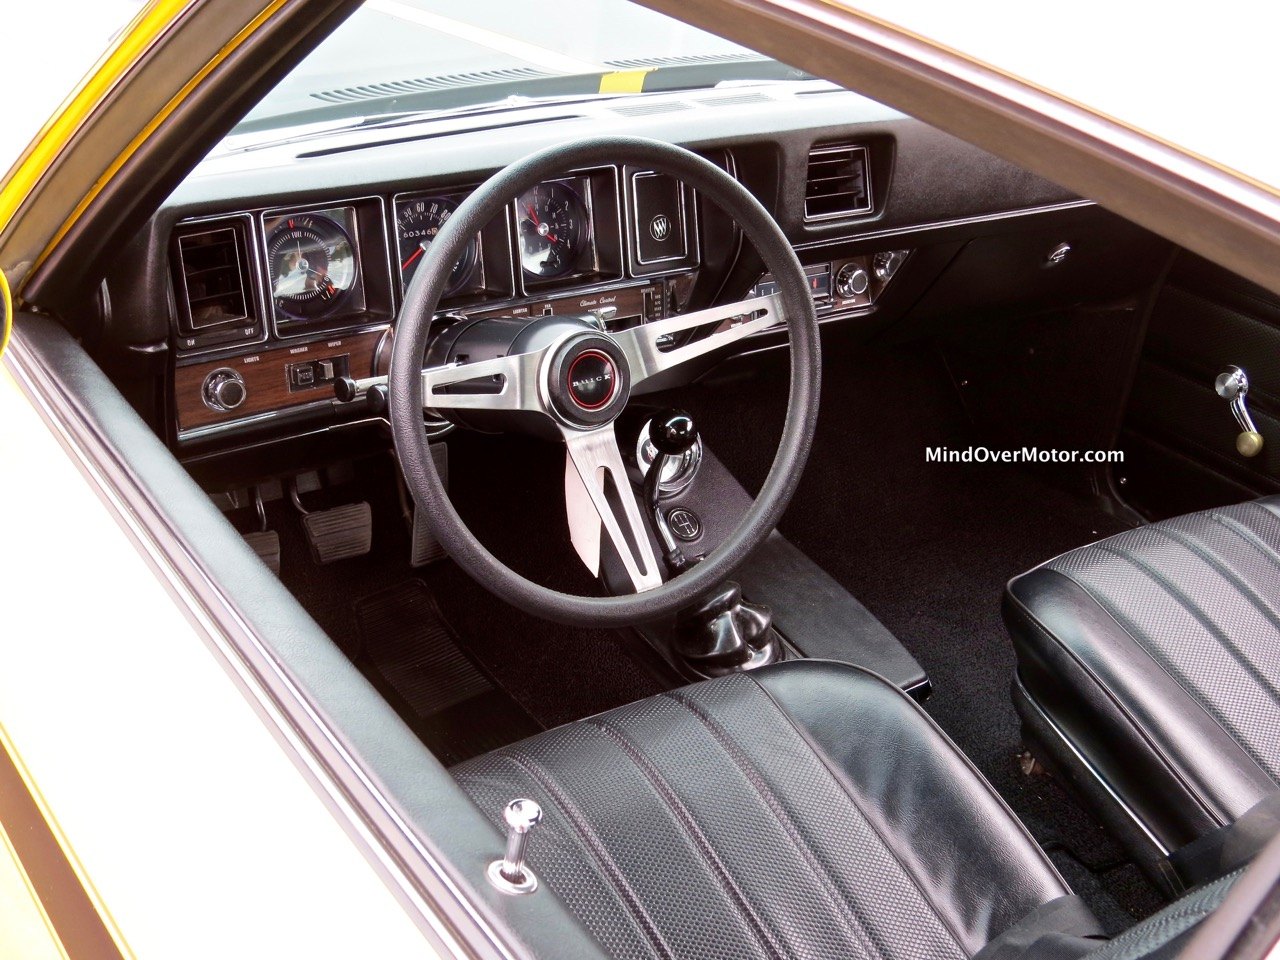 1970 Buick GSX Interior